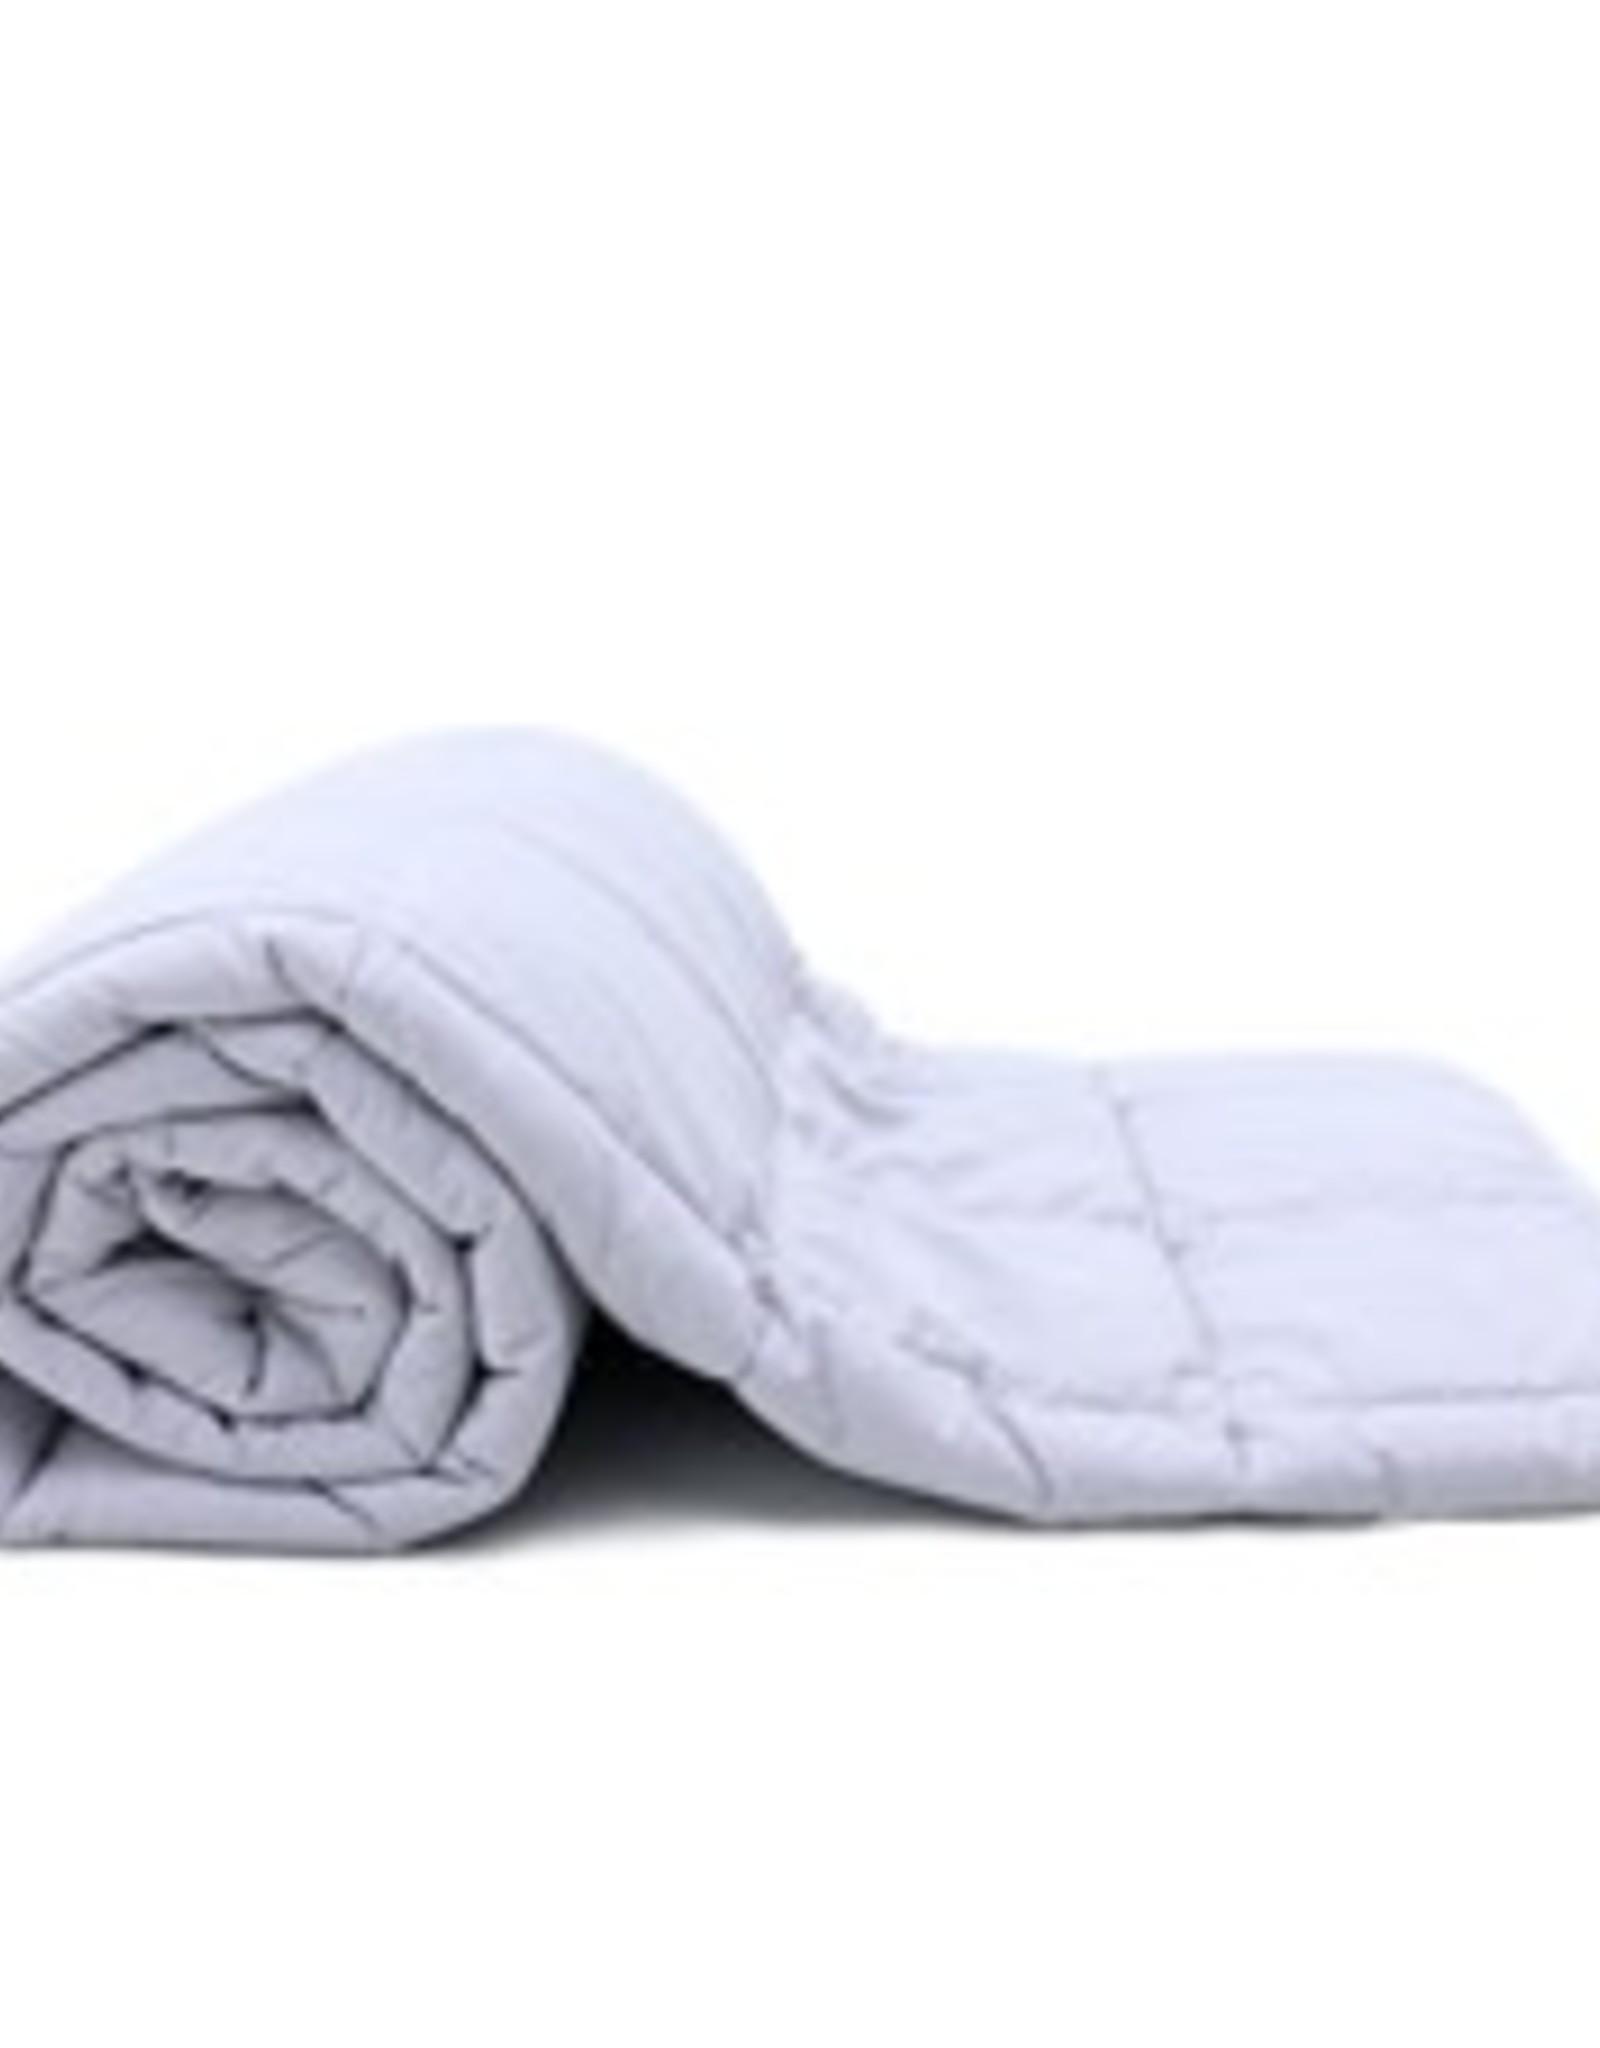 Daniadown Weighted Blanket Daniadown